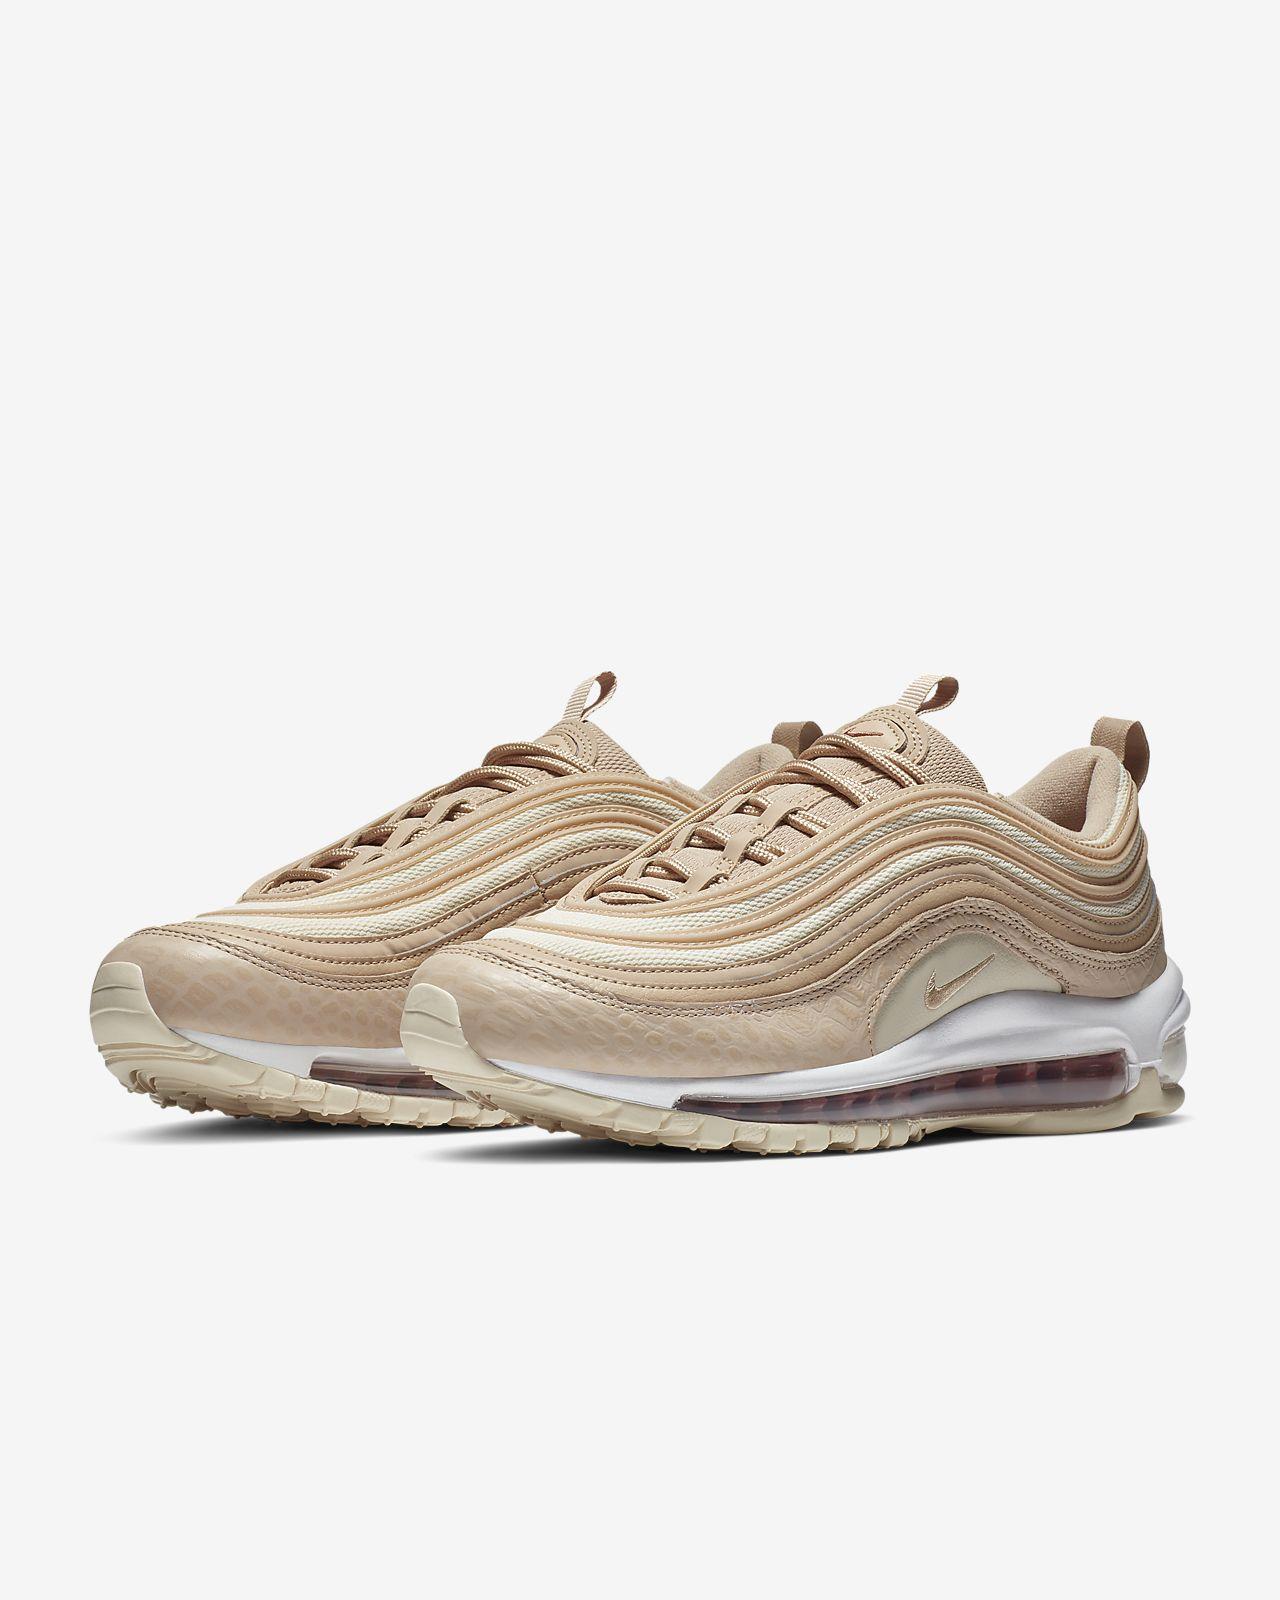 arrives 1d8d1 5a010 ... Nike Air Max 97 LX Women s Shoe